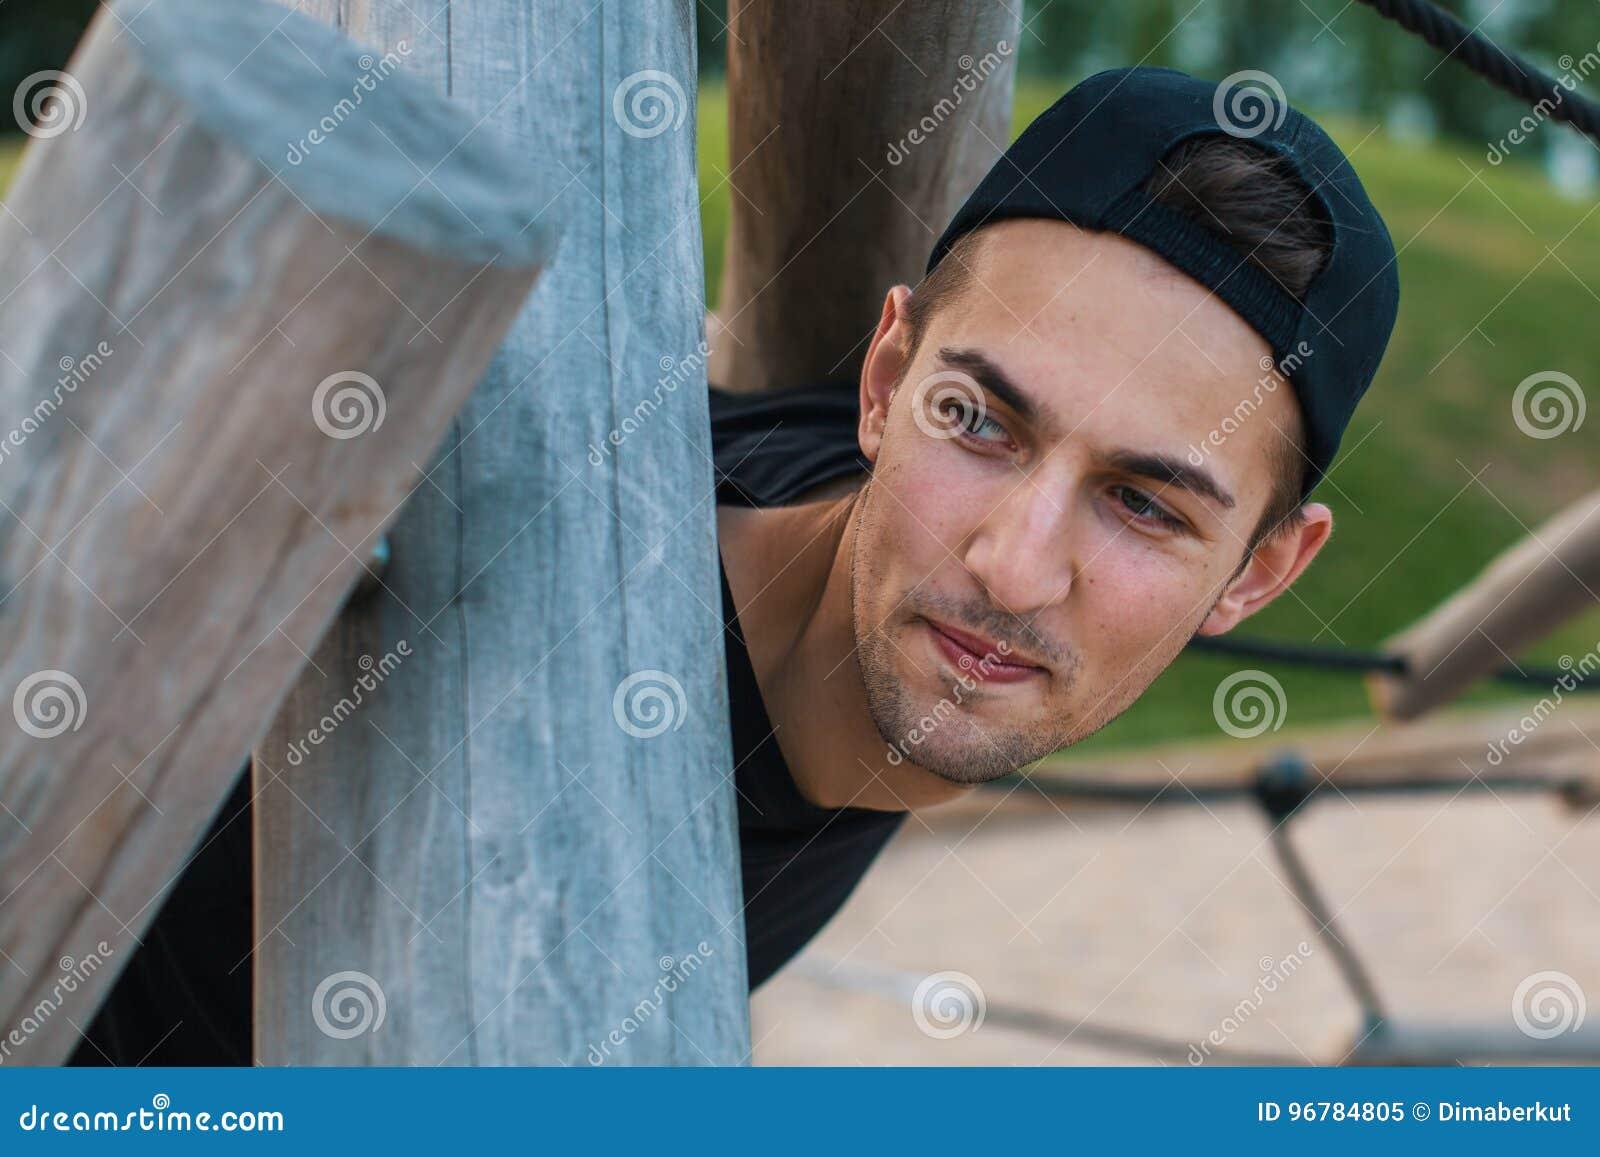 Retrato del individuo divertido al aire libre